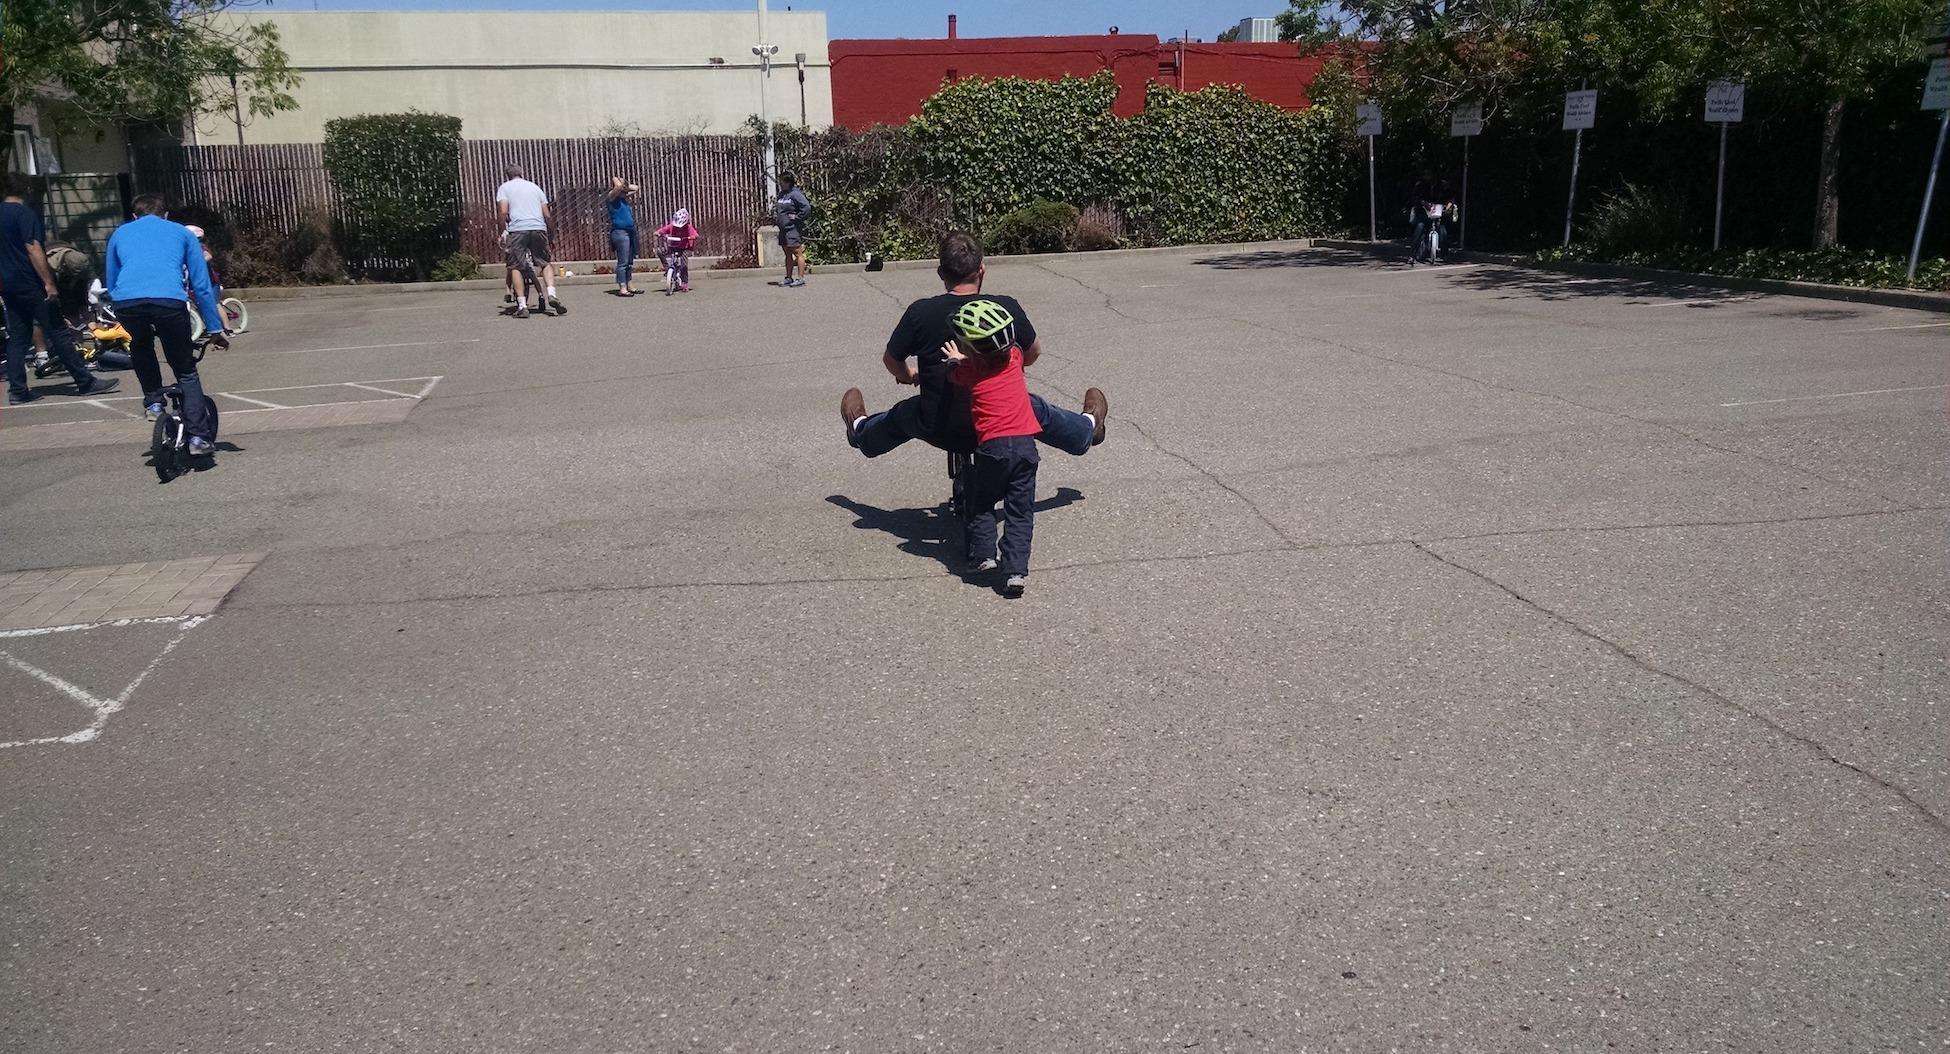 Kid pushing an adult on a kid's bike